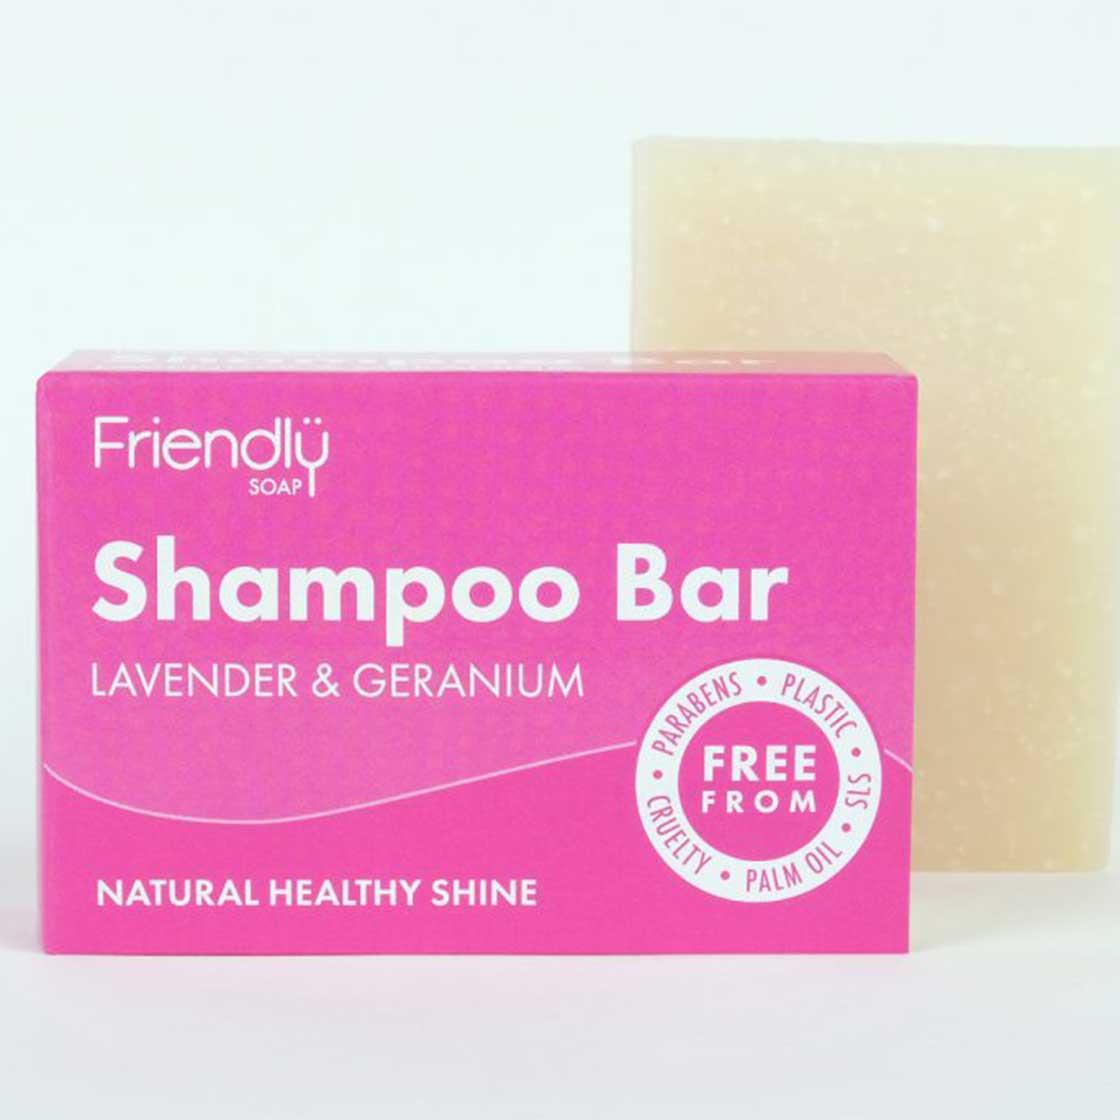 Shampoo Bar - Lavender & Geranium by Friendly Soap